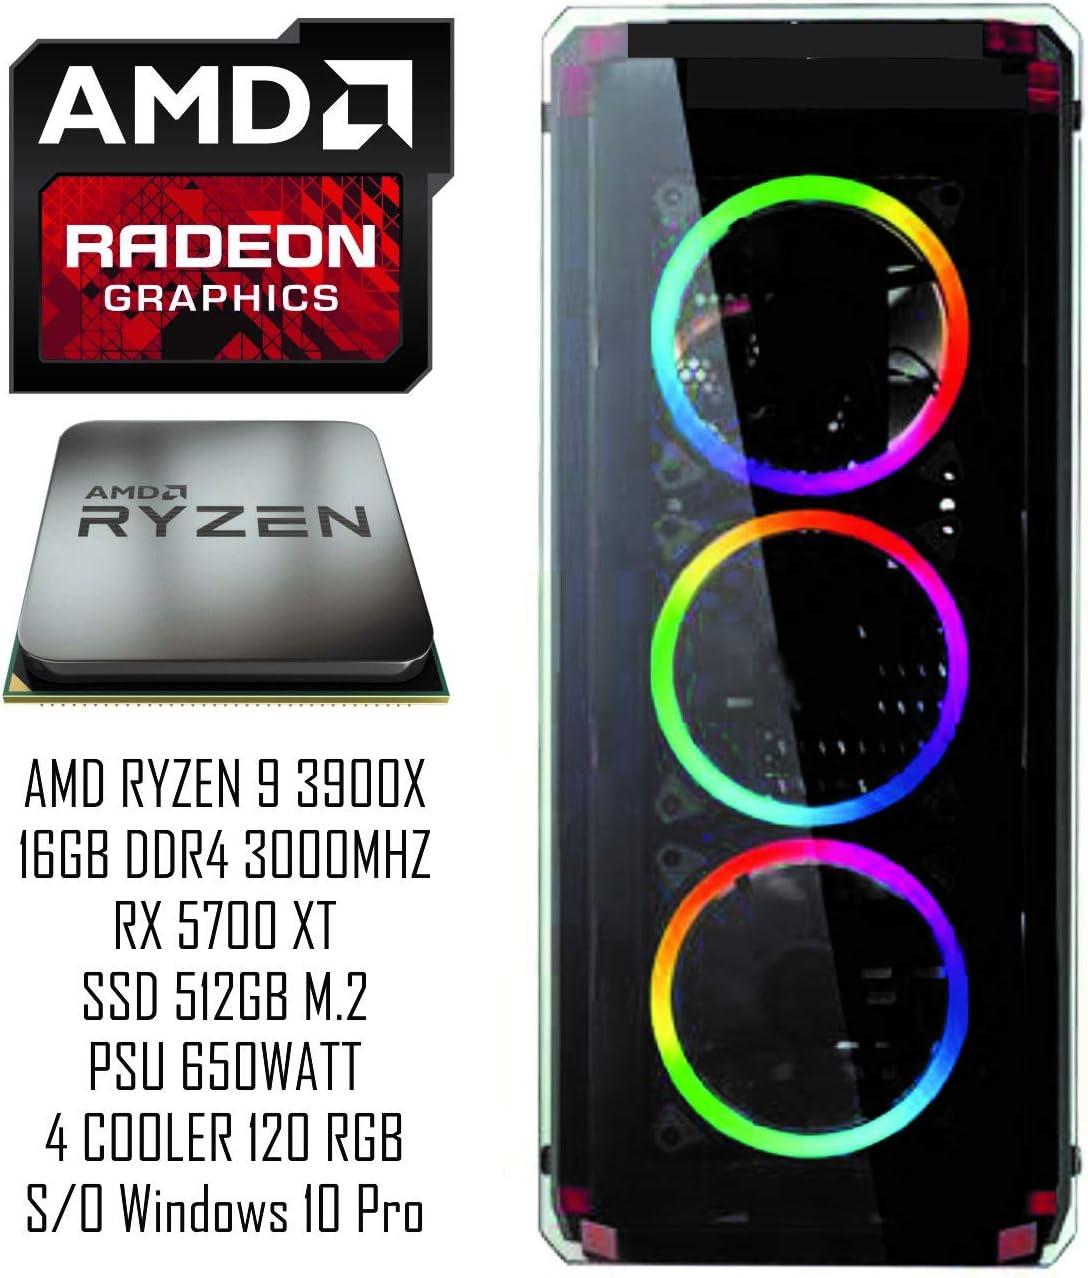 PC Gaming REDI AV4500 G6 39X AMD RYZEN 9 3900X A320M RX 5700 XT DDR4 16GB 3000 SSD M.2 512GB 650WATT Radix: Amazon.es: Informática